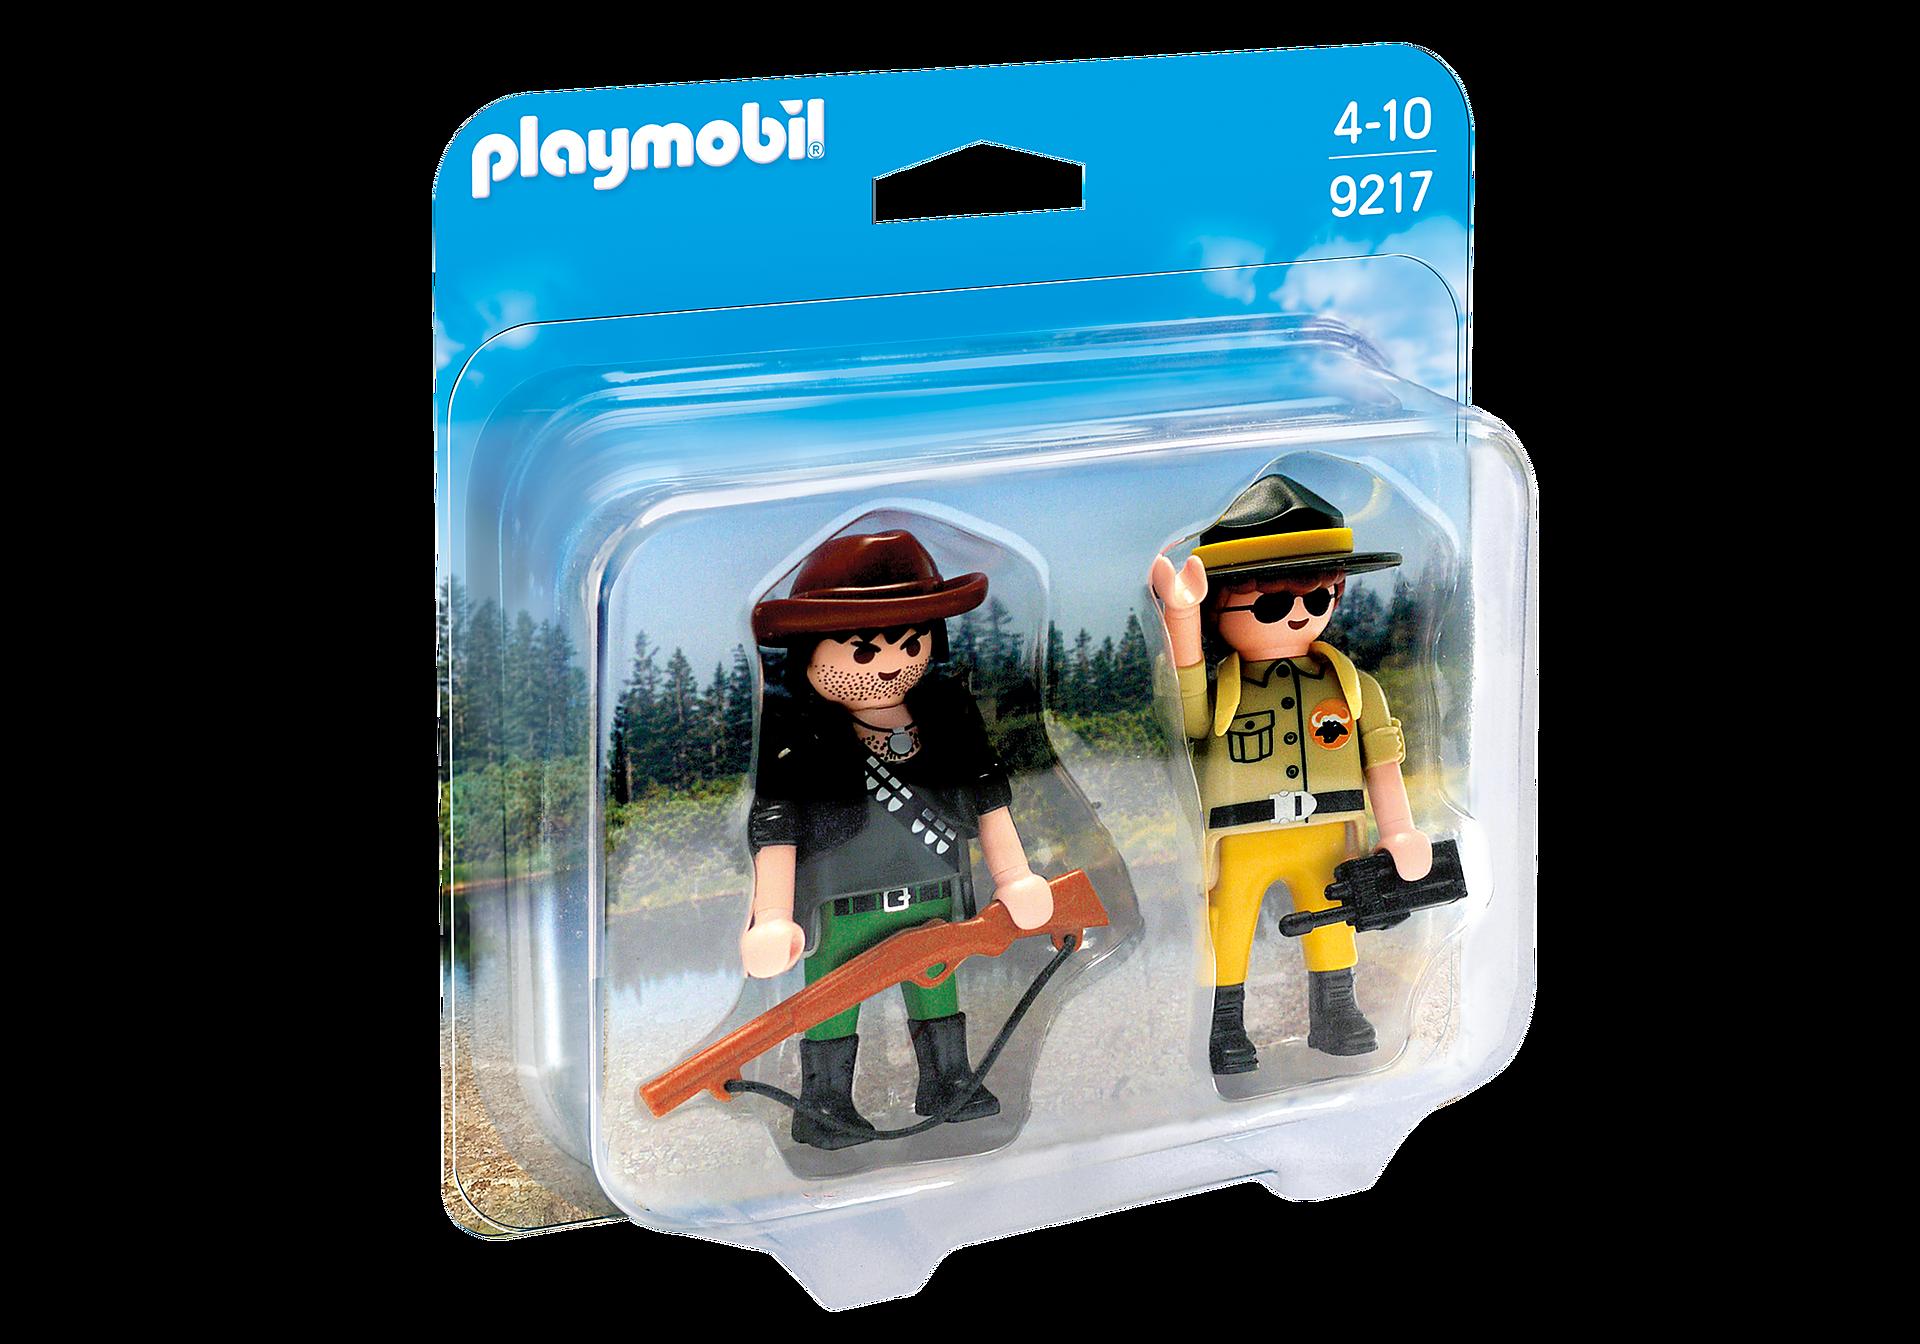 9217 PLAYMOBIL DuoPack Garde forestier et braconnier zoom image3